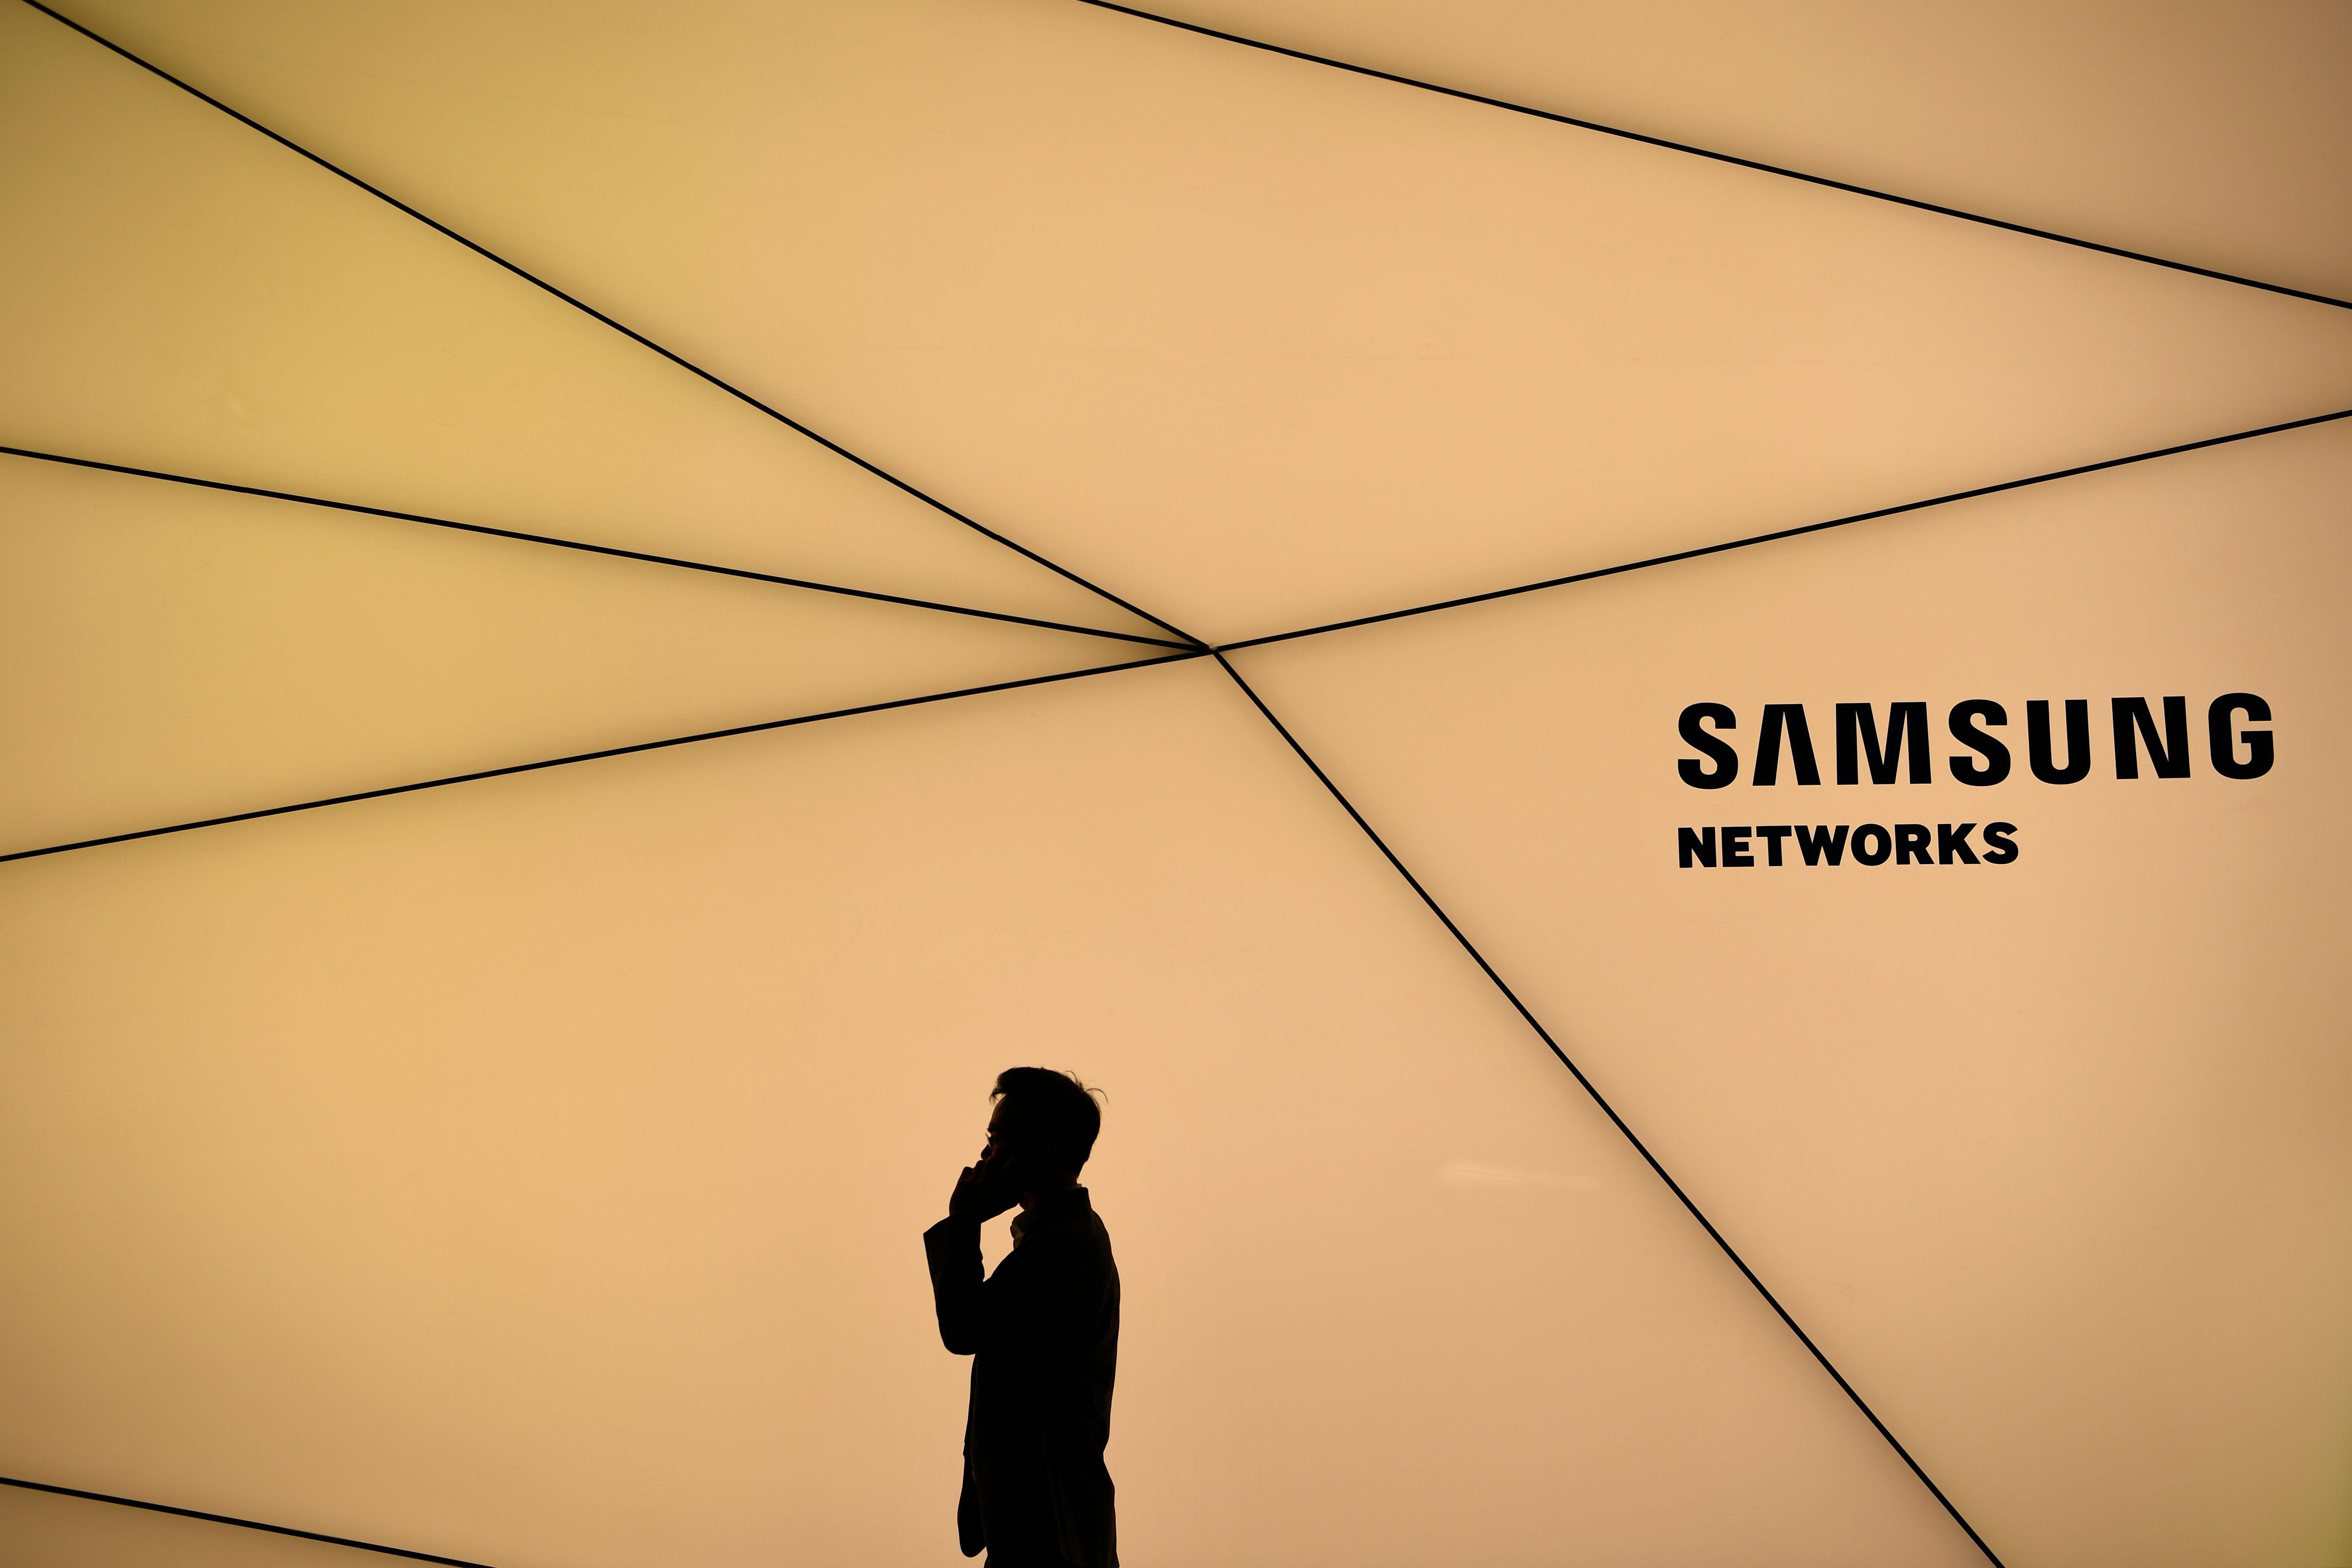 samsung_networks